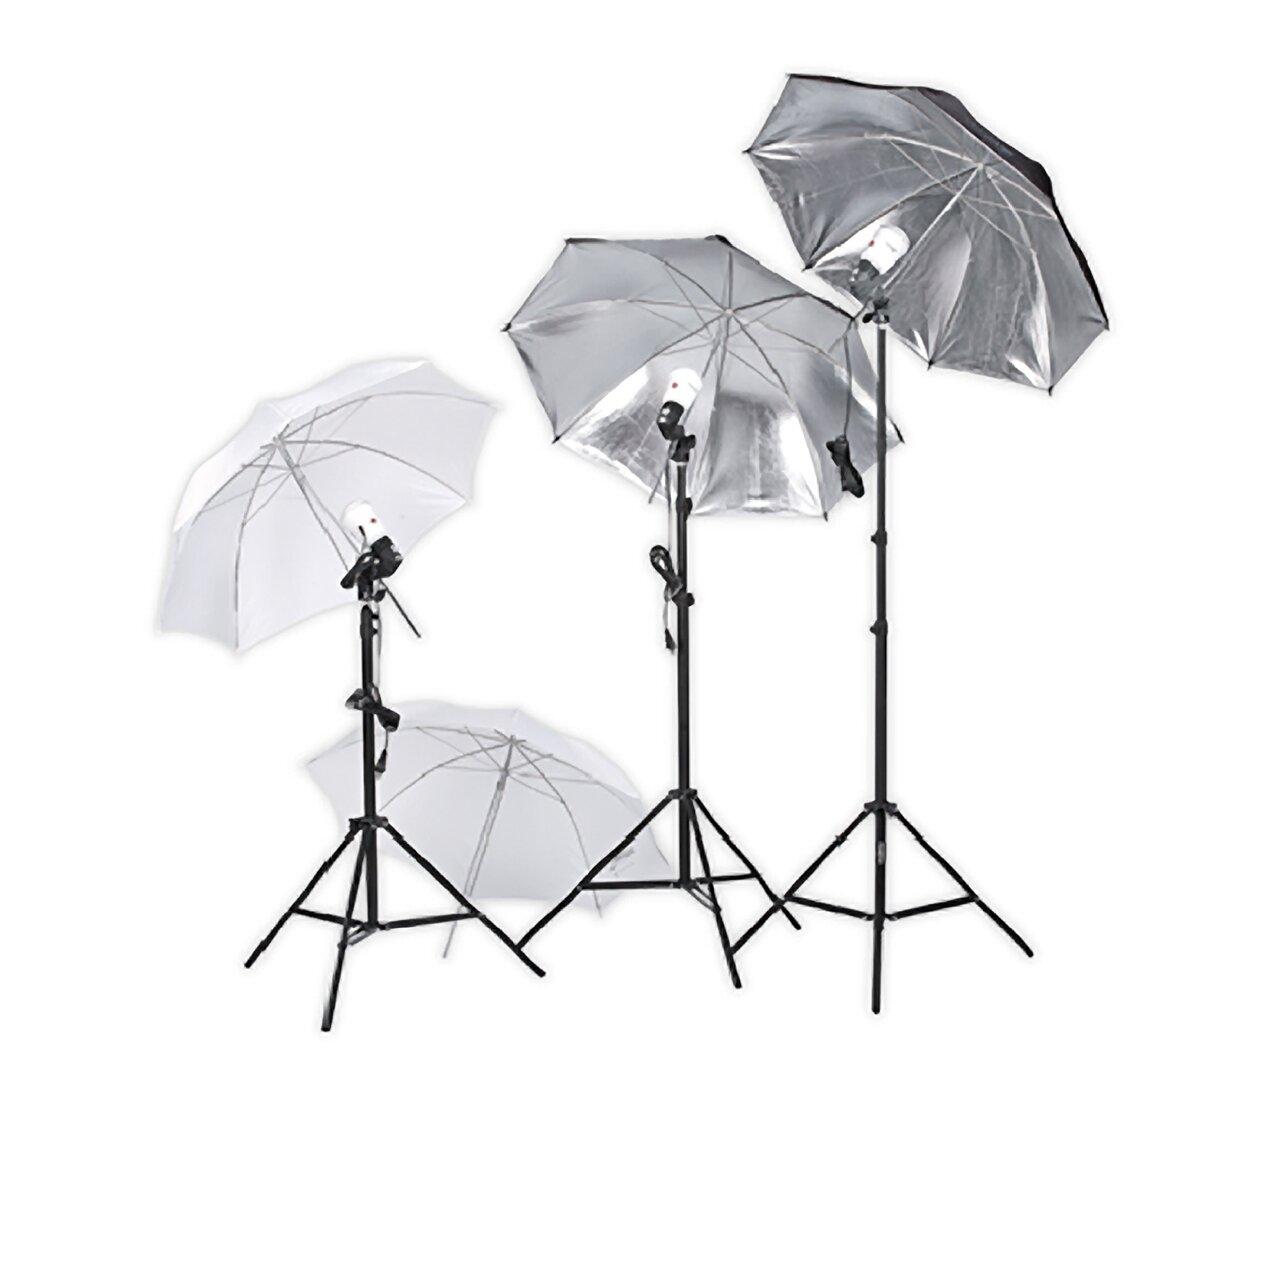 Professional Photography Studio Lighting Umbrella Soft